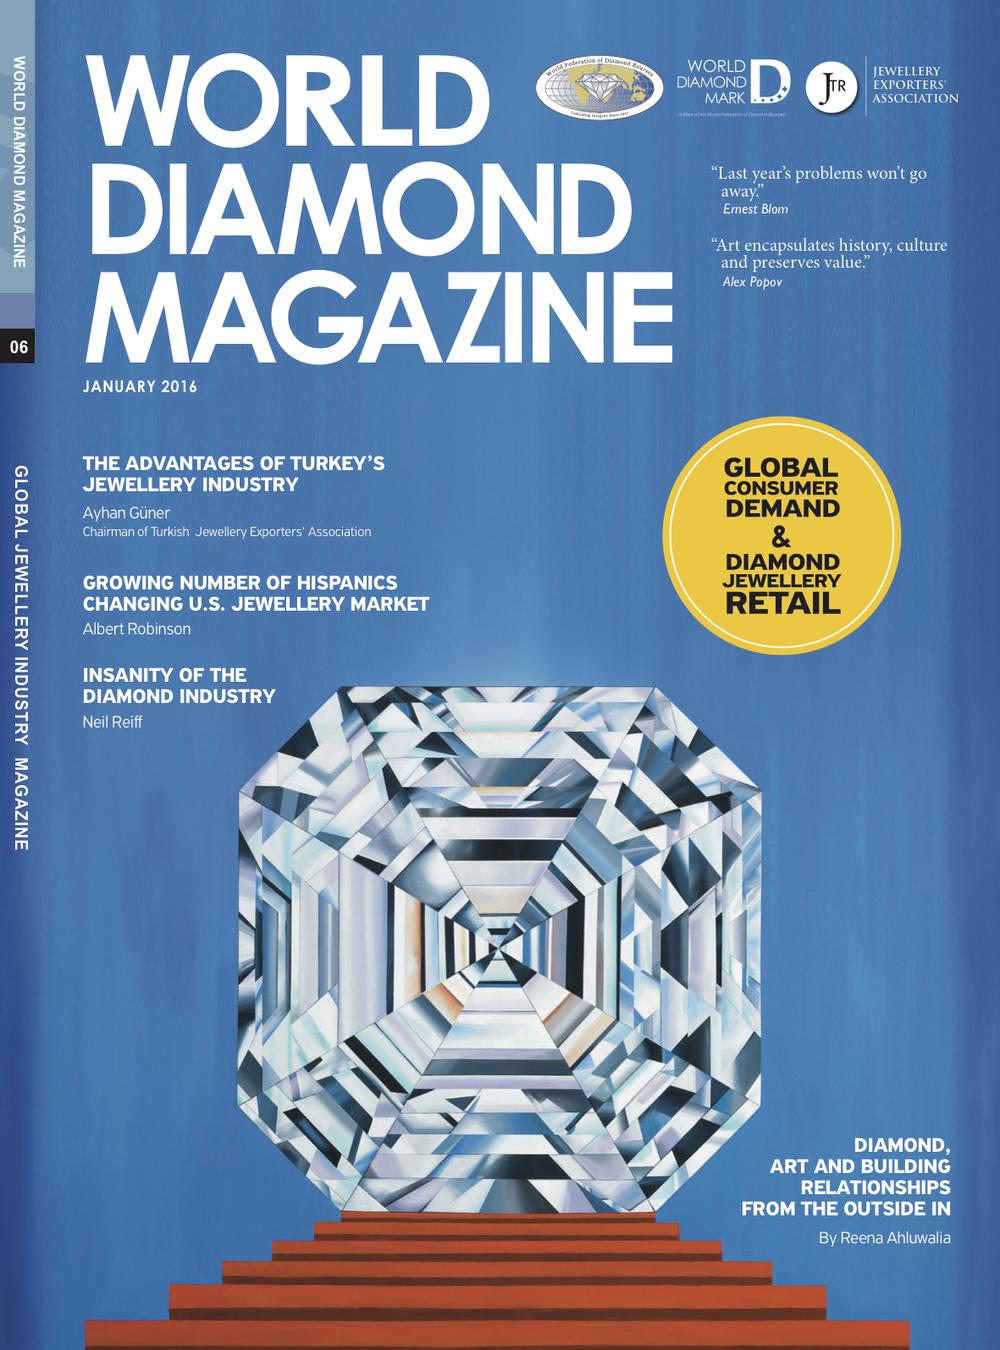 World Diamond Magazine_Reena Ahluwalia_Ya'akov Almor